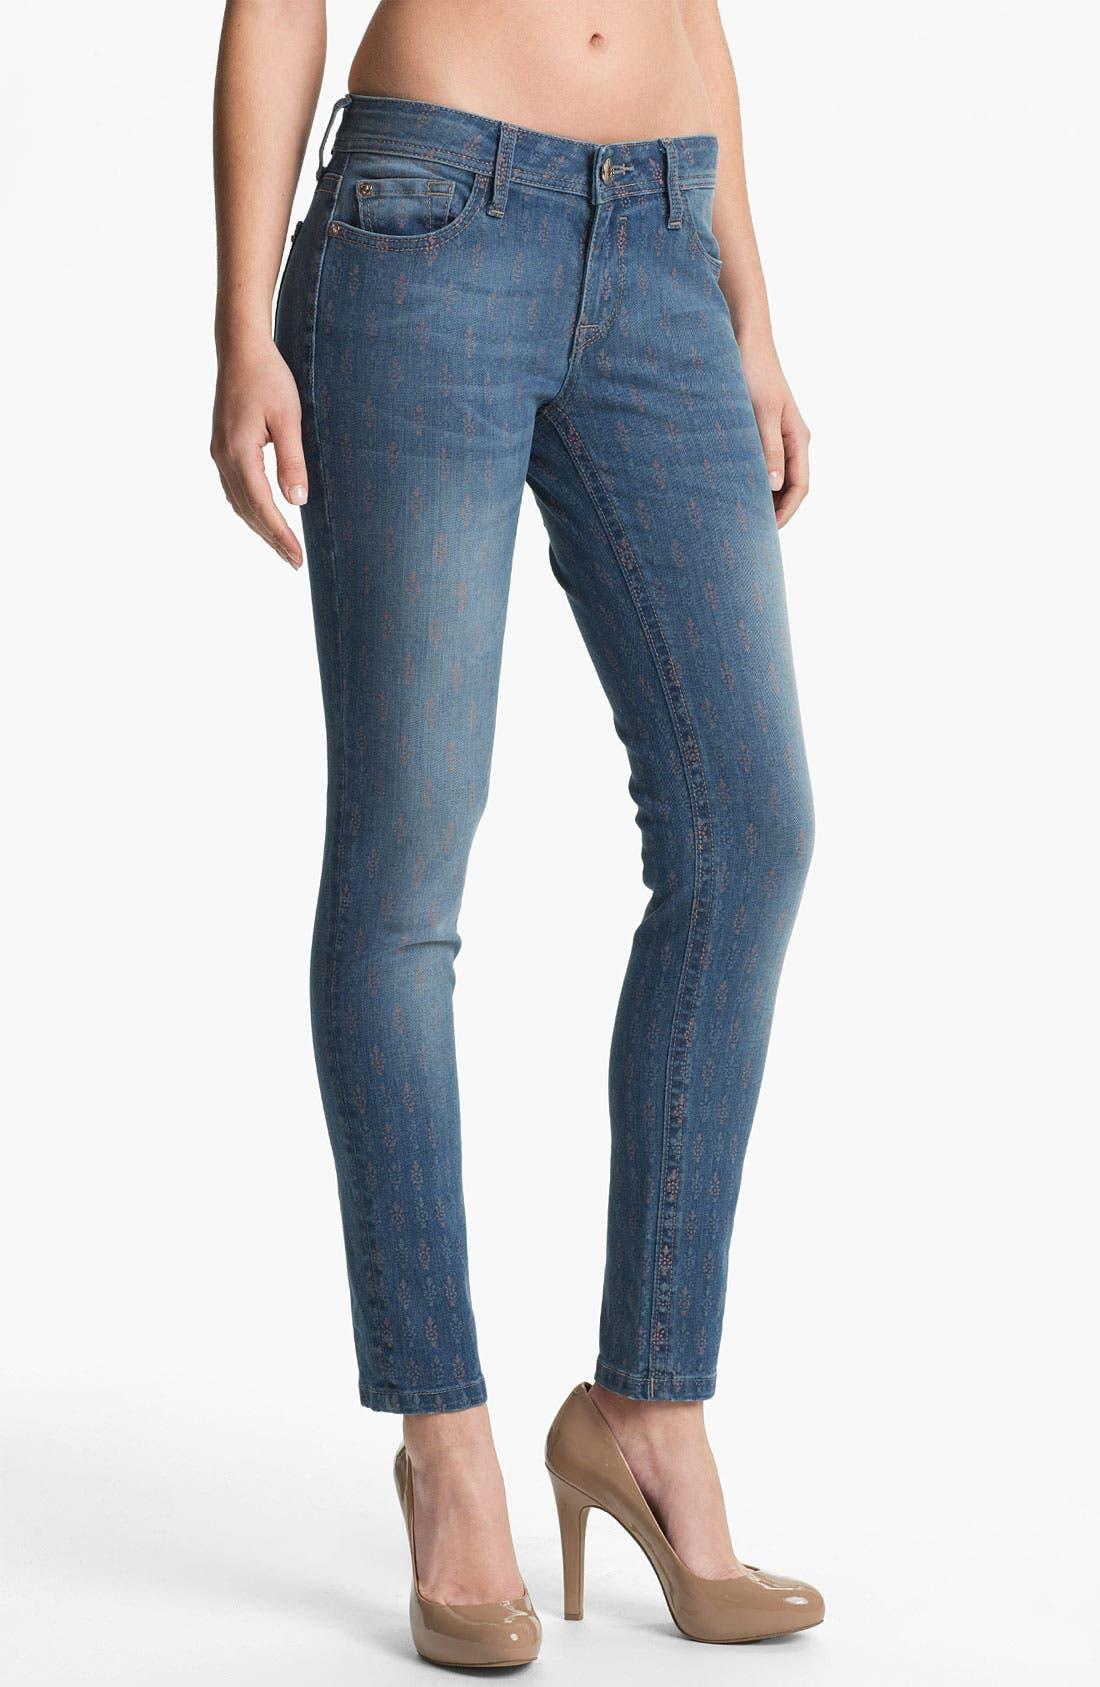 Alternate Image 1 Selected - DL1961 'Amanda' X-Fit Stretch Print Denim Skinny Jeans (Greenville)